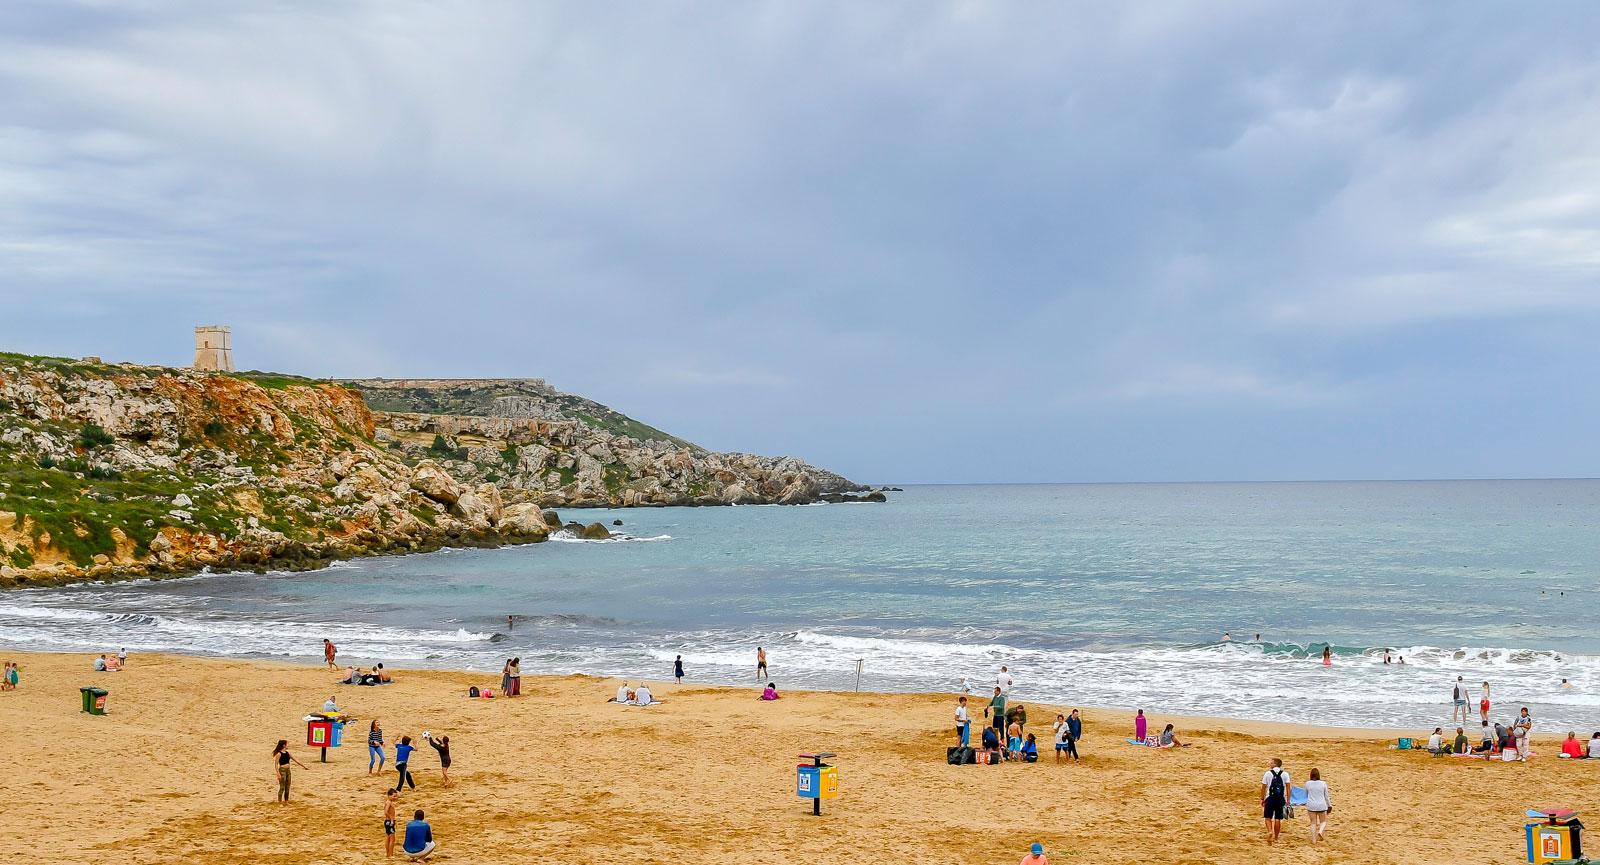 Golden Bay lever upp till sitt namn med sin gyllengula sandstrand.